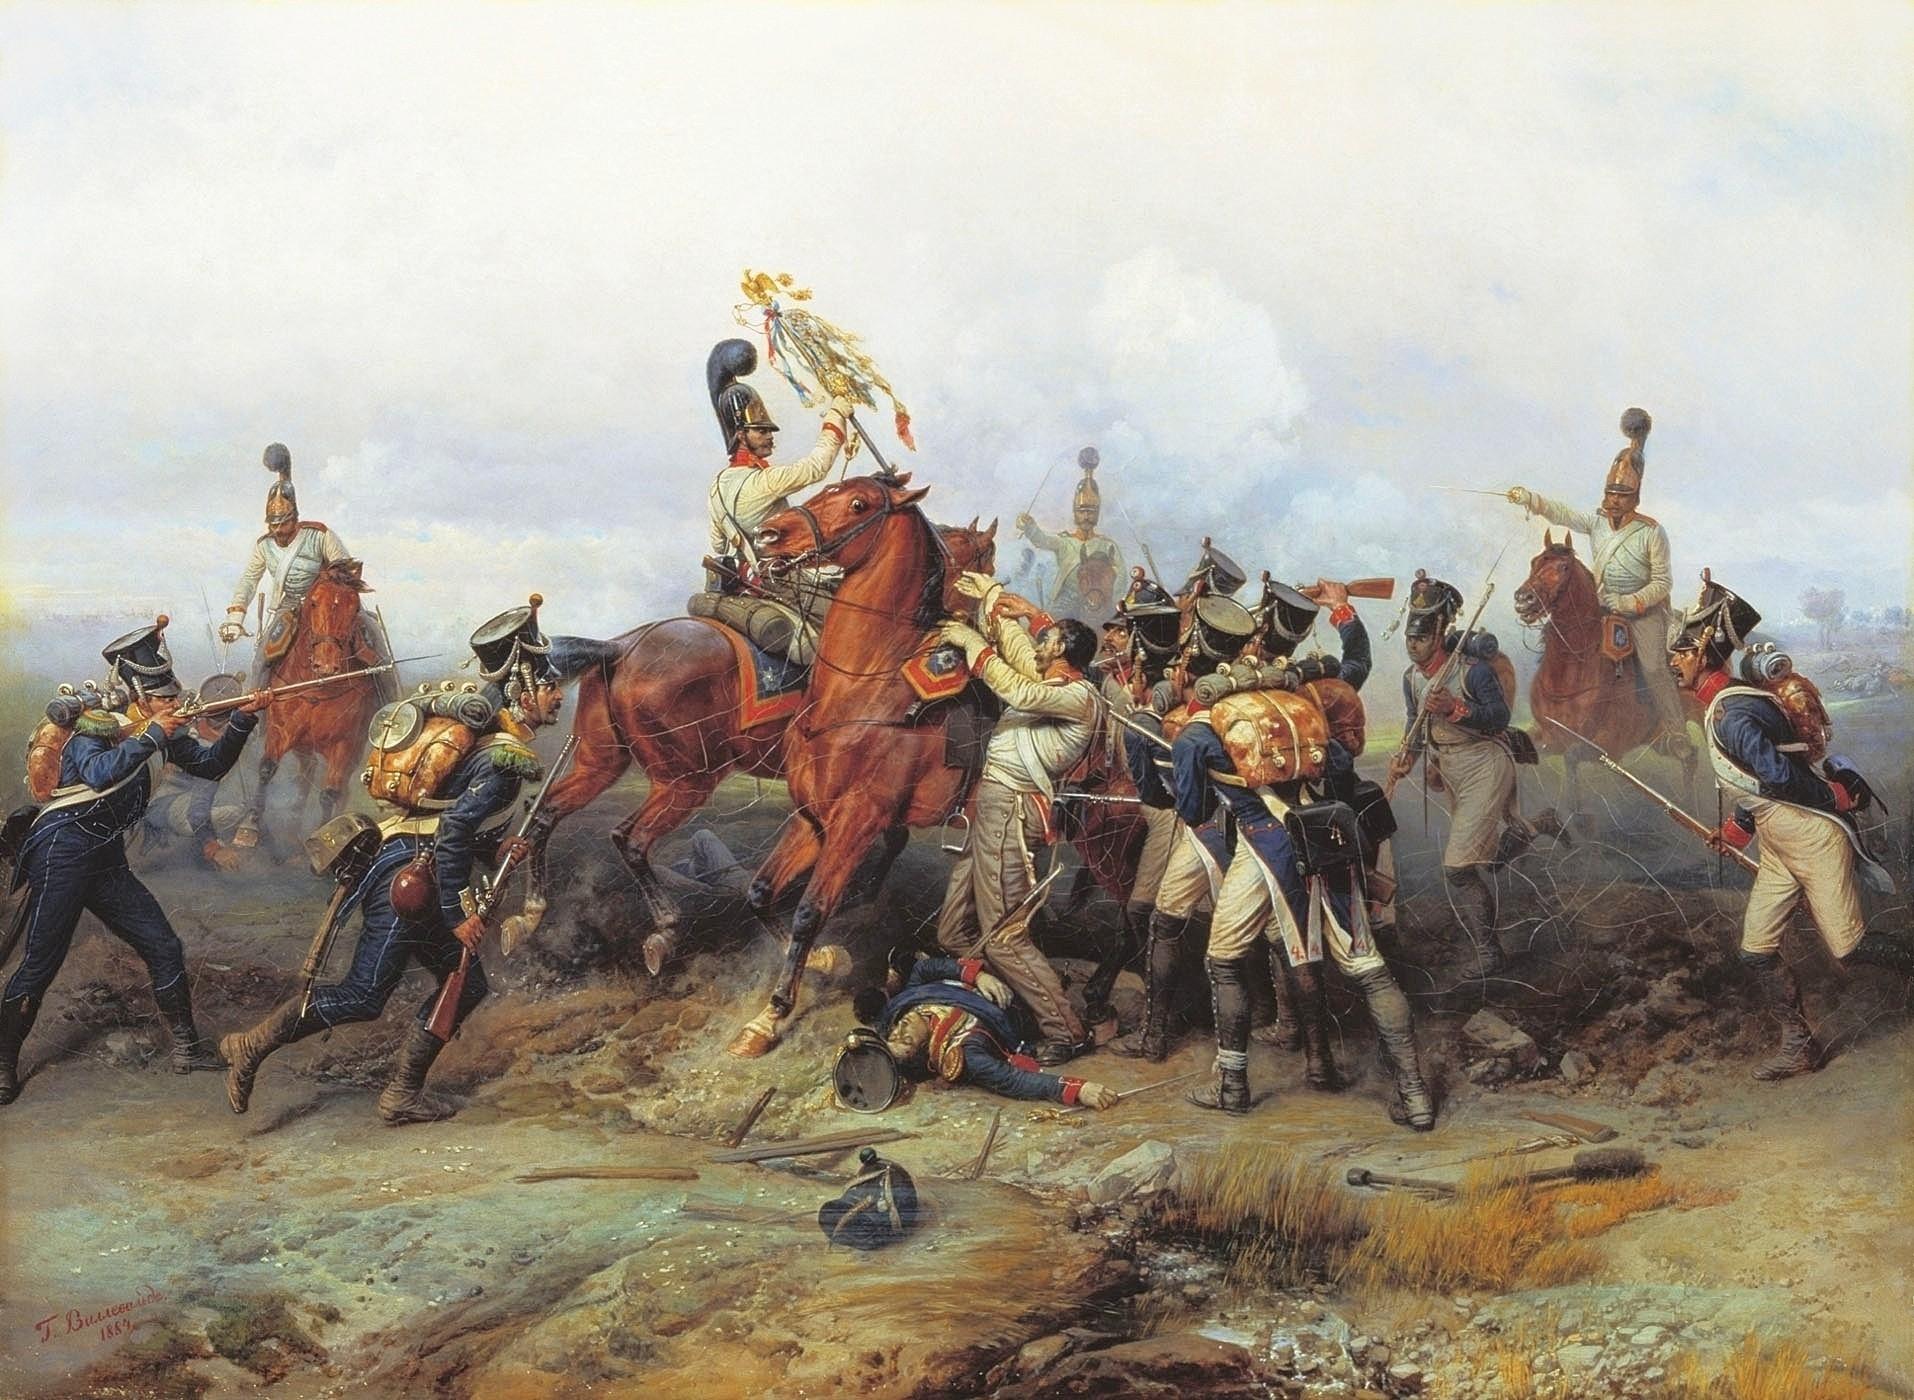 Willewalde_-_Czar's_Guard_capture_4th_line_regiment's_standard_at_Austerlitz